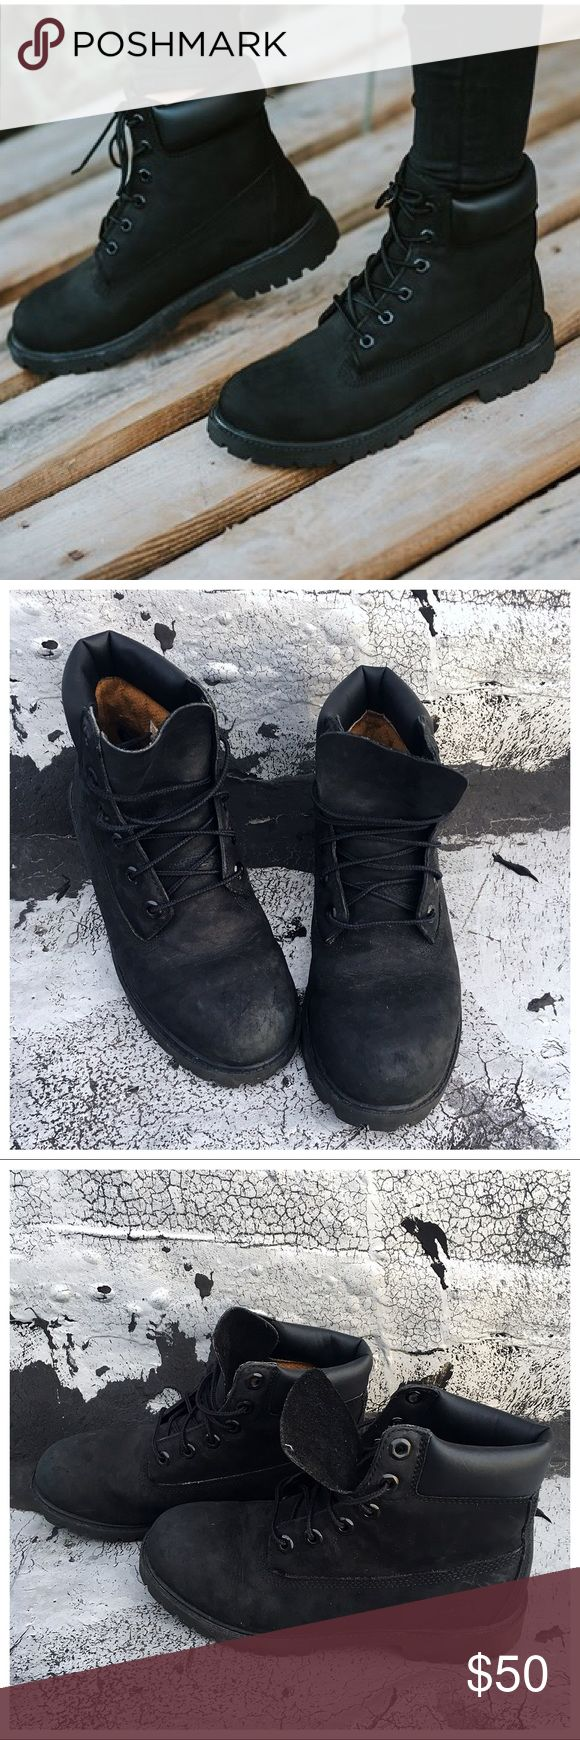 Timberland Premium Boots Timberland Premium Black Boots Timberland Shoes Boots